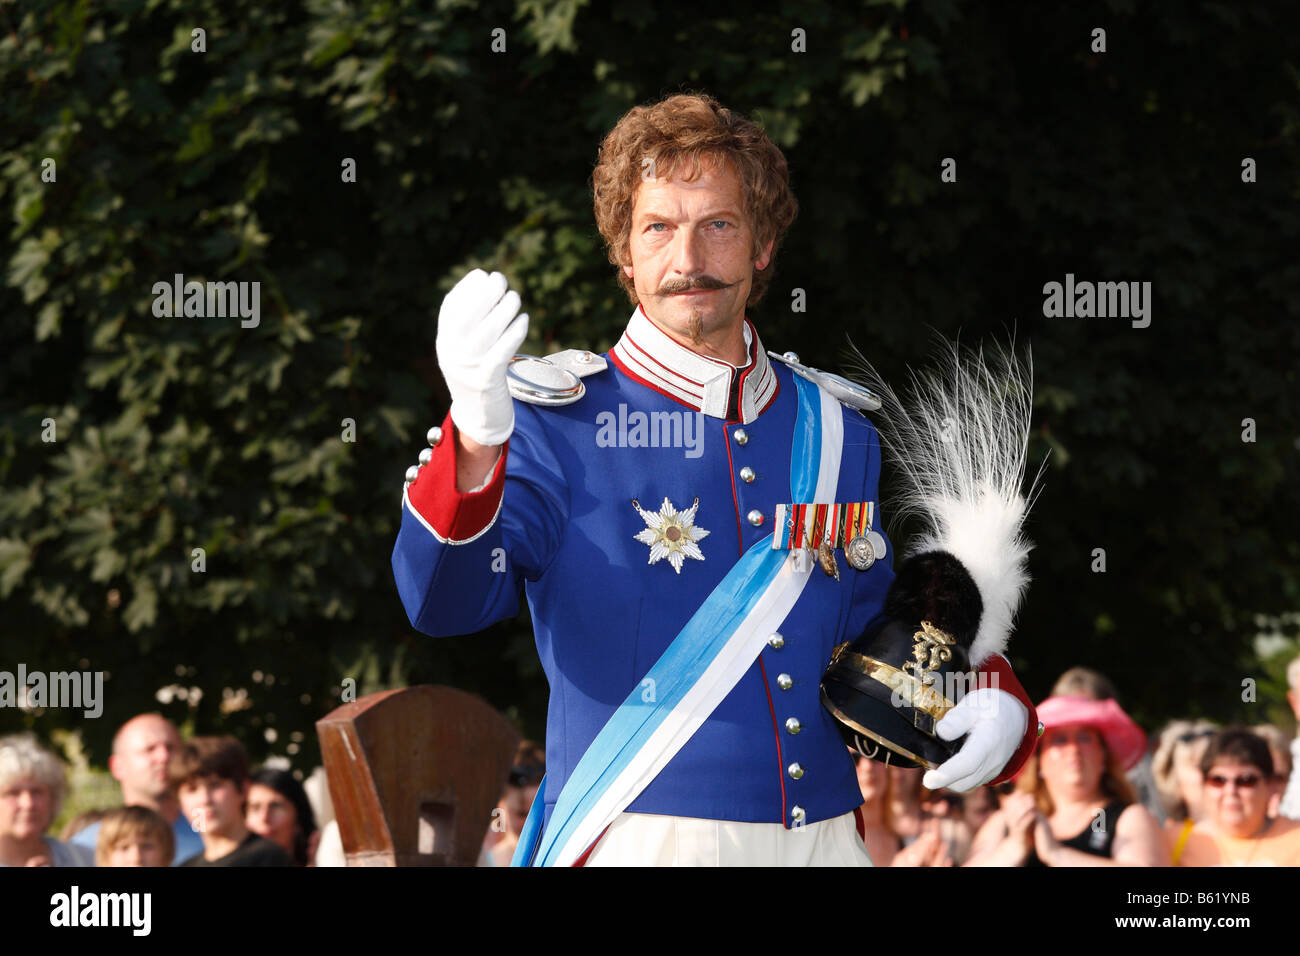 Man dressed as King Ludwig I, Rákóczi-Fest festival, Bad Kissingen, Rhoen, Lower Franconia, Bavaria, Germany, - Stock Image